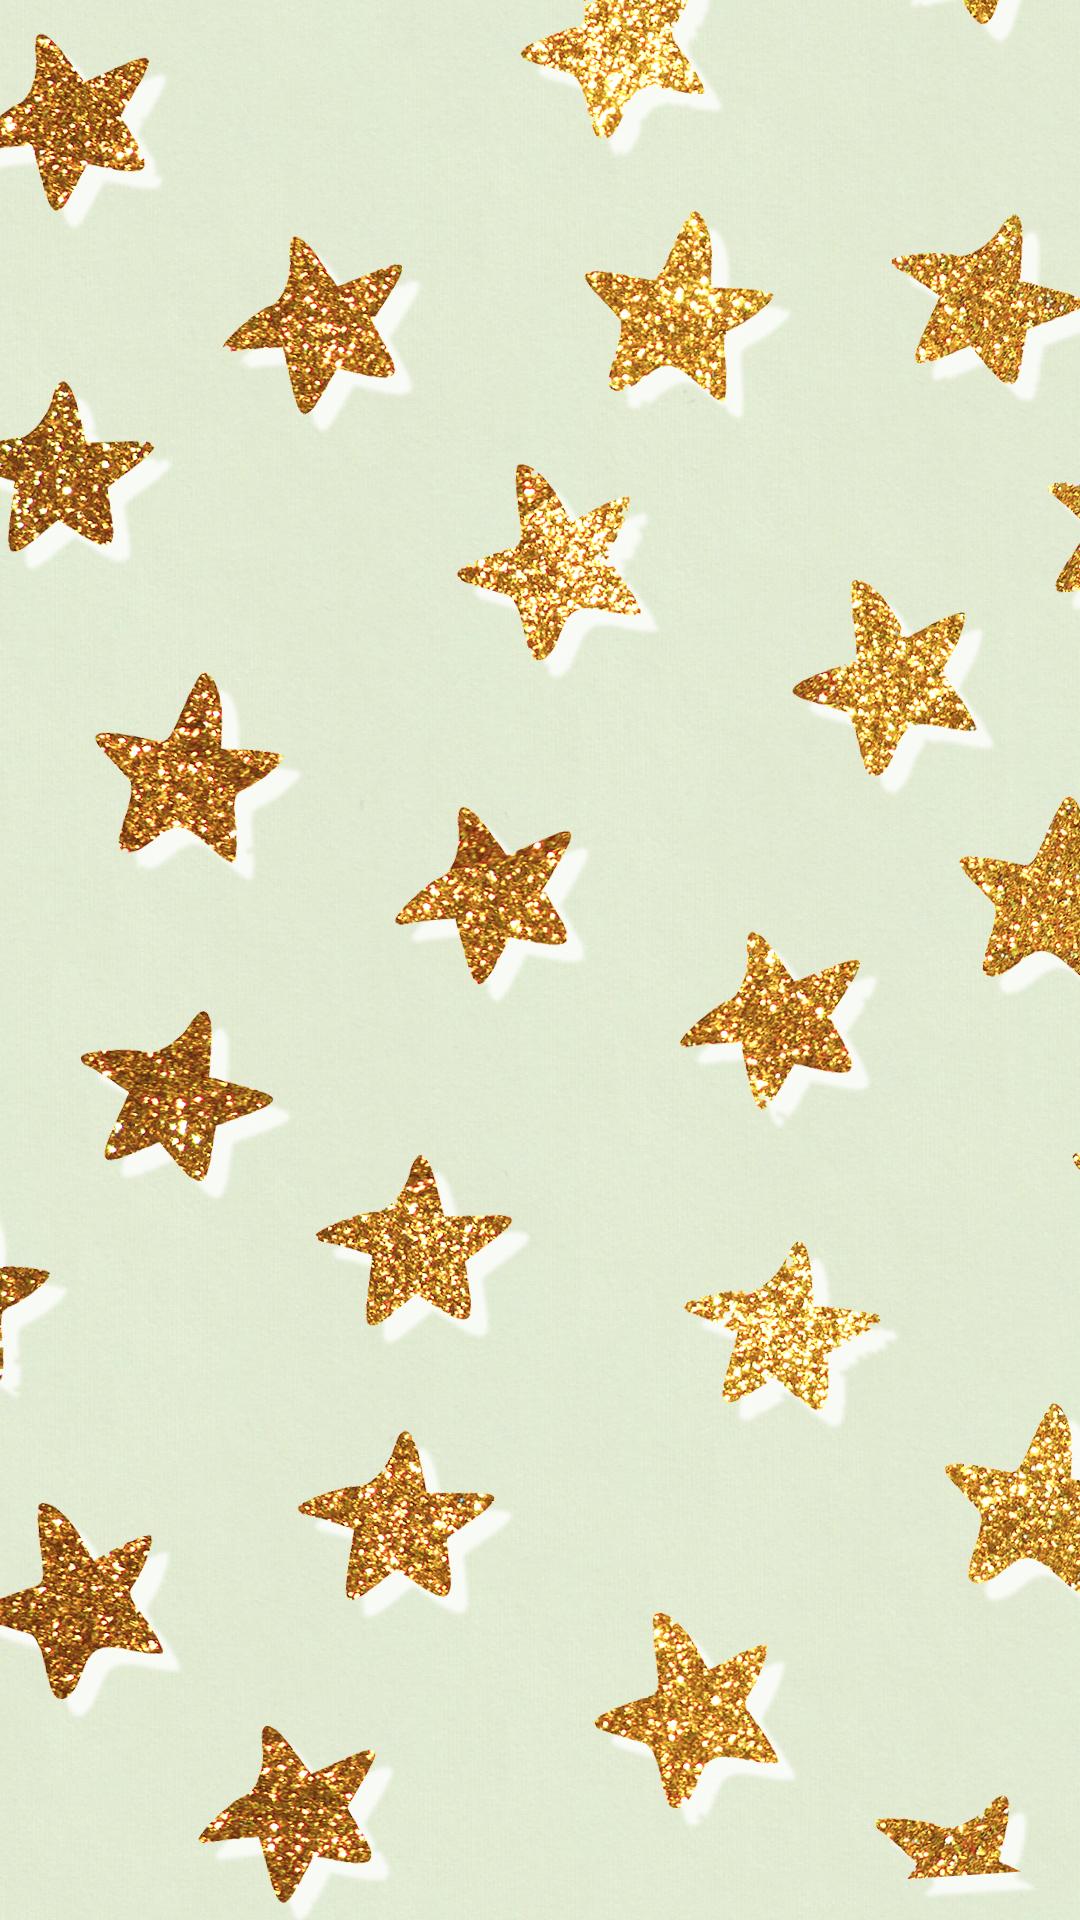 c u t e  aesthetic glitter star pattern